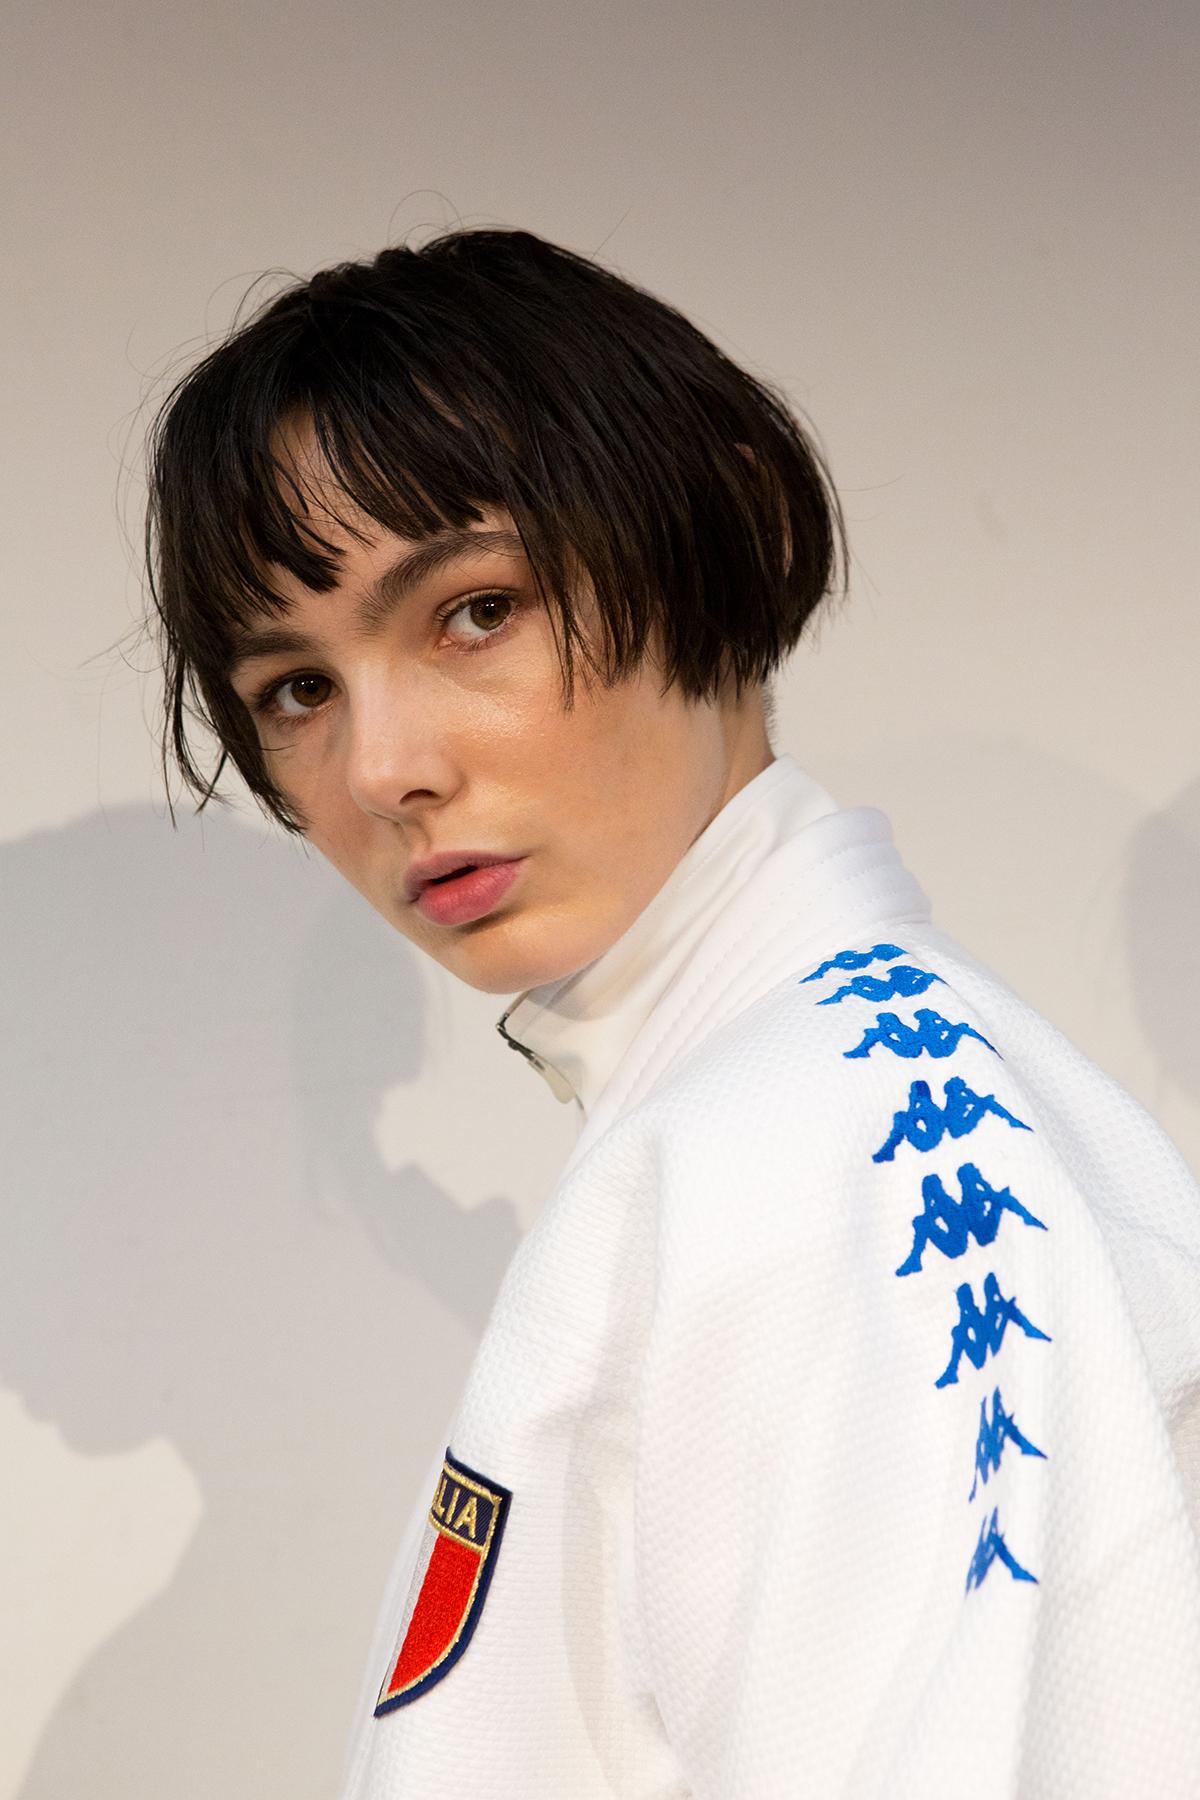 12_kappa_runway_editorial_fashion_federica_borgato